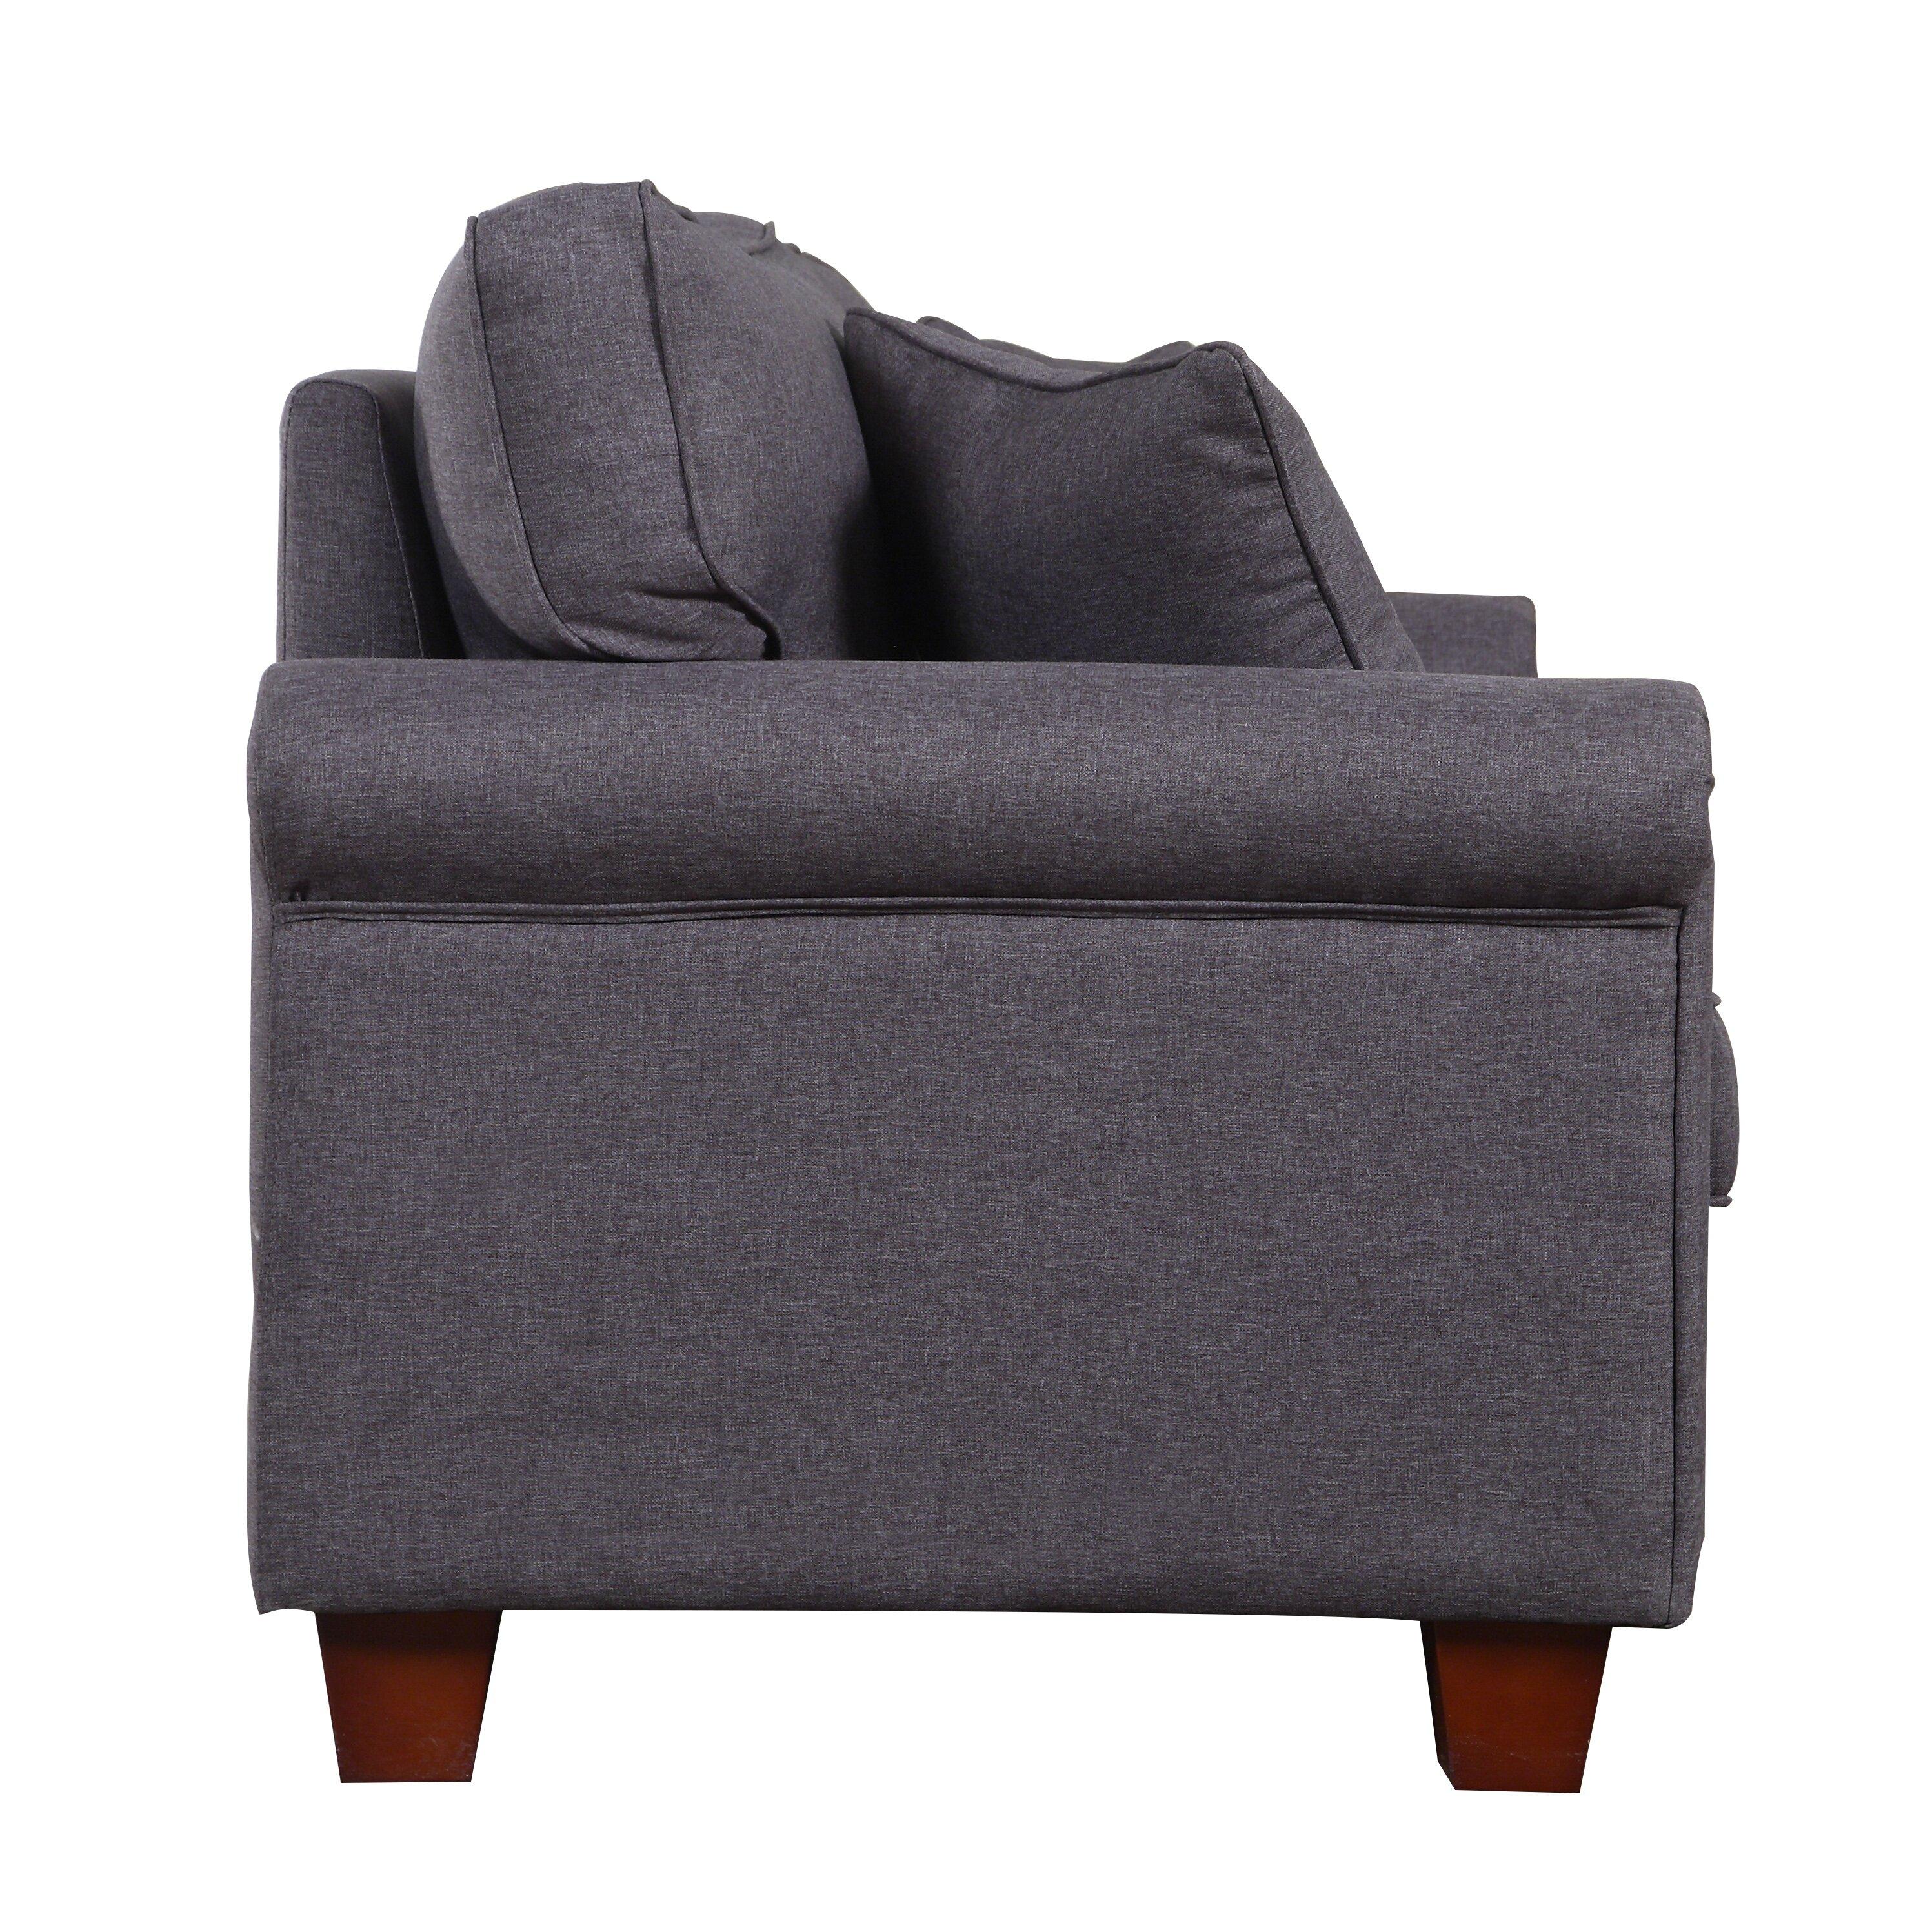 Madrid Taupe Beige Ultra Modern Living Room Furniture 3: Classic Living Room Linen Fabric Sofa